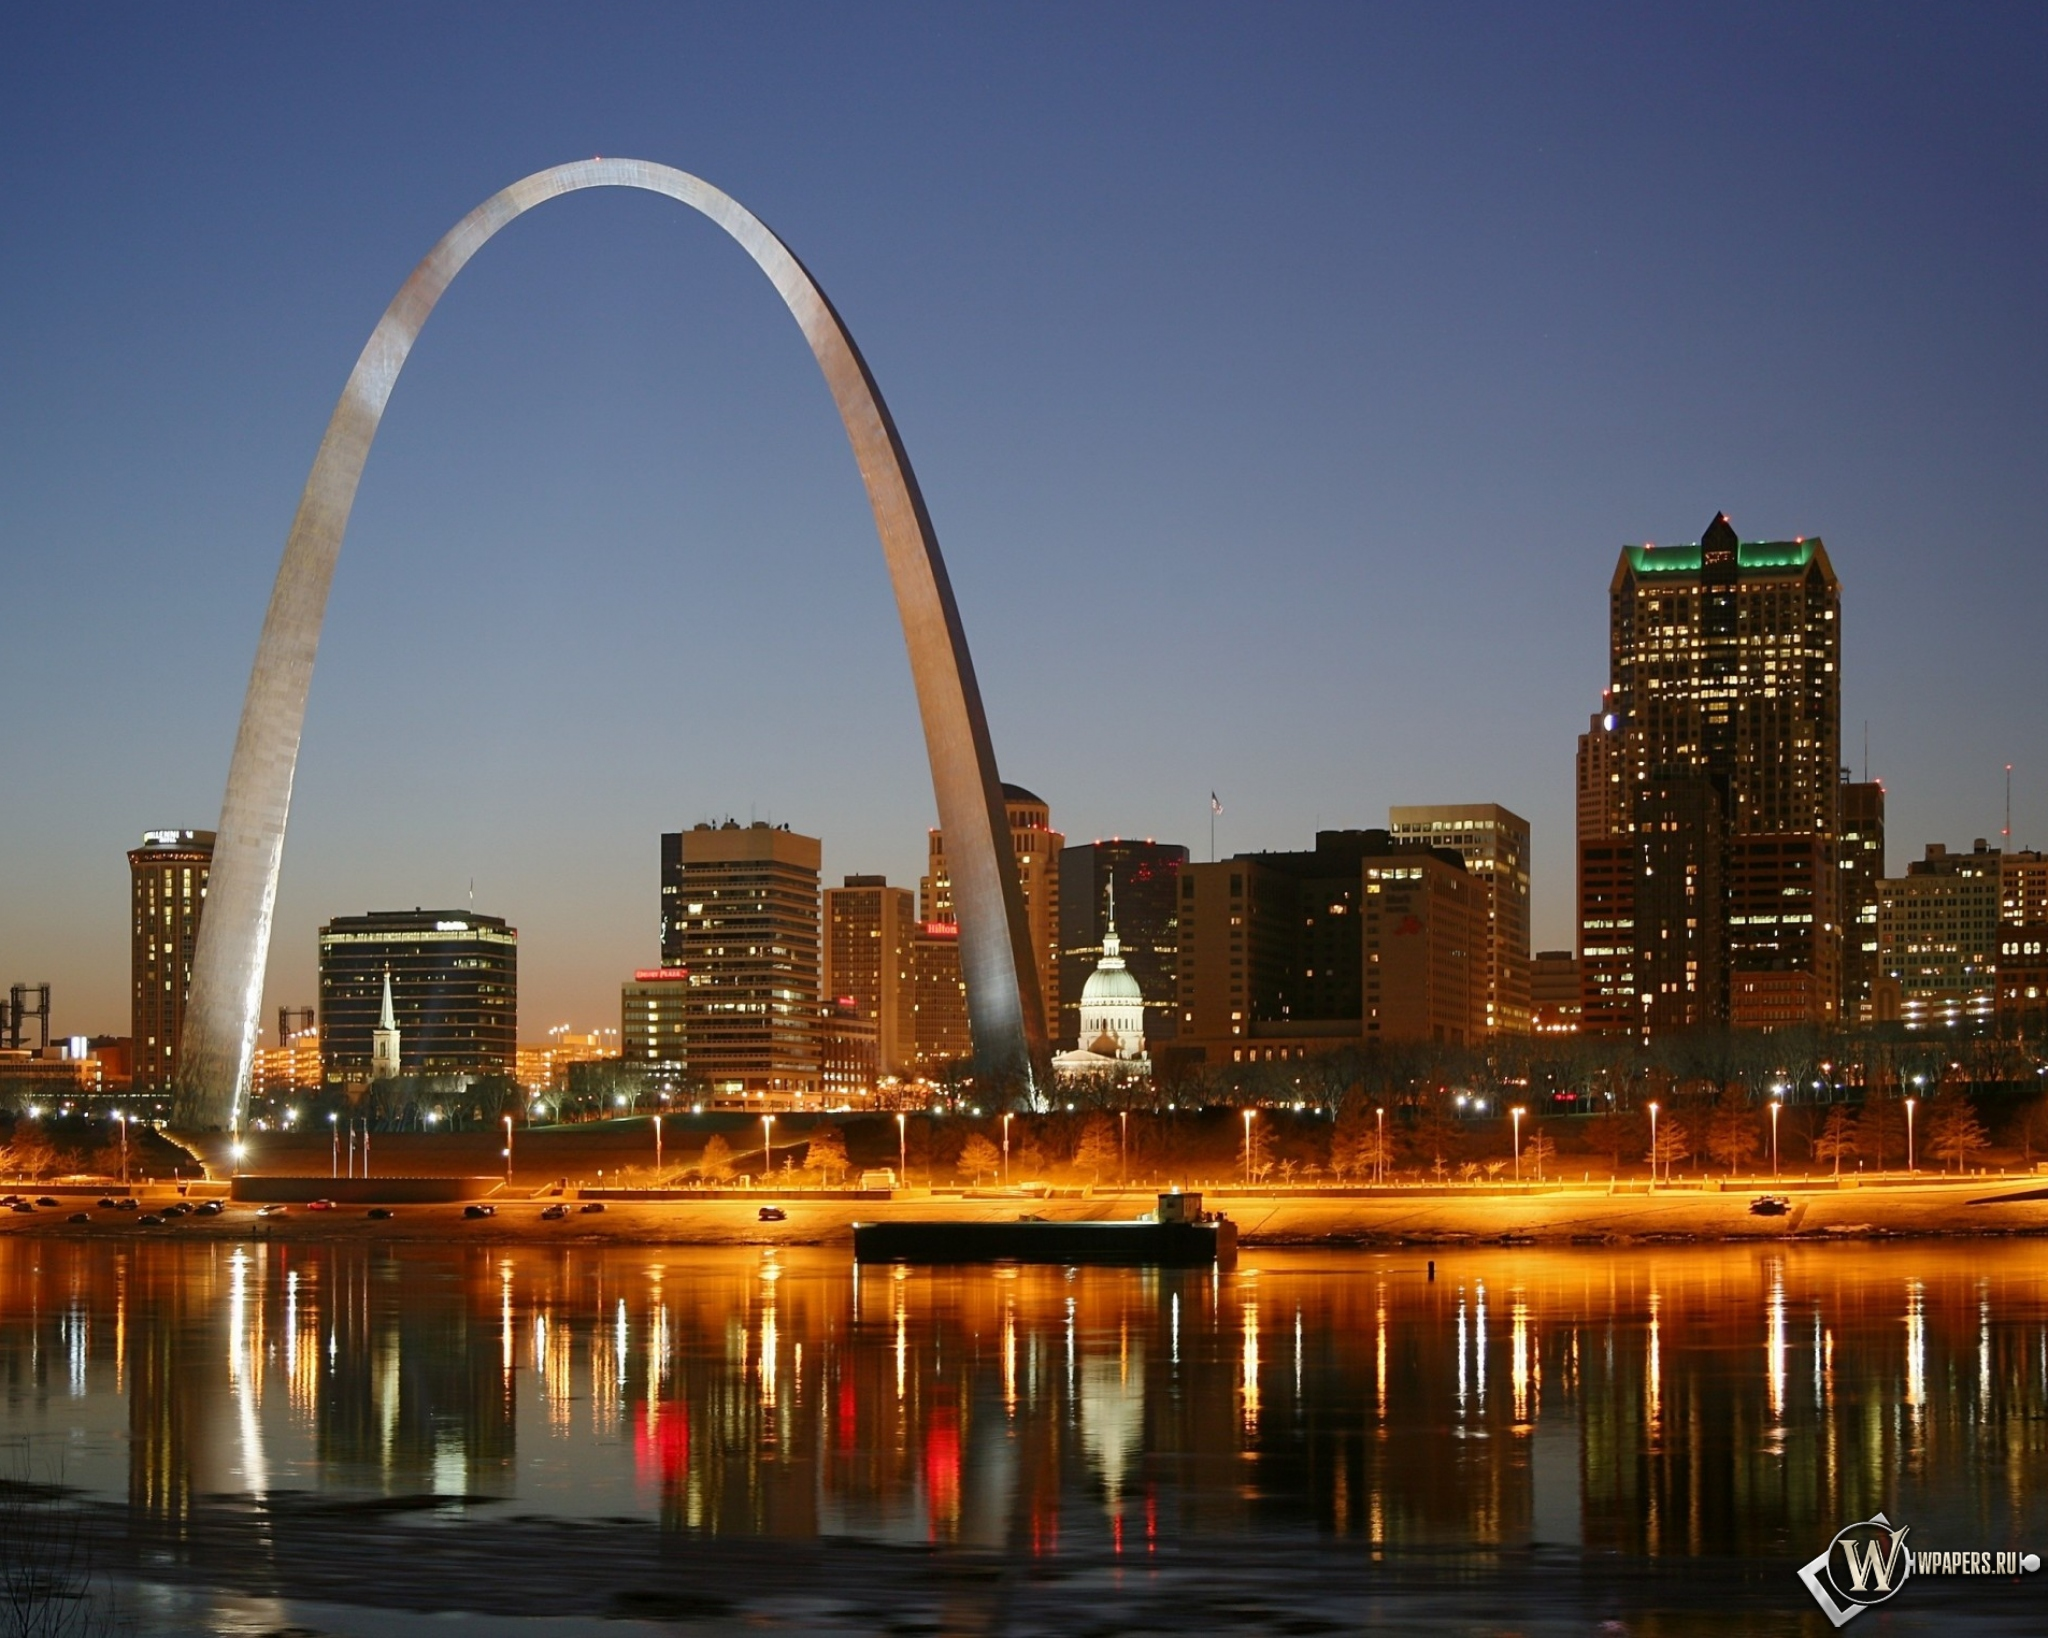 City of Lake Saint Louis, Missouri, USA City of st. louis photo enforcement program